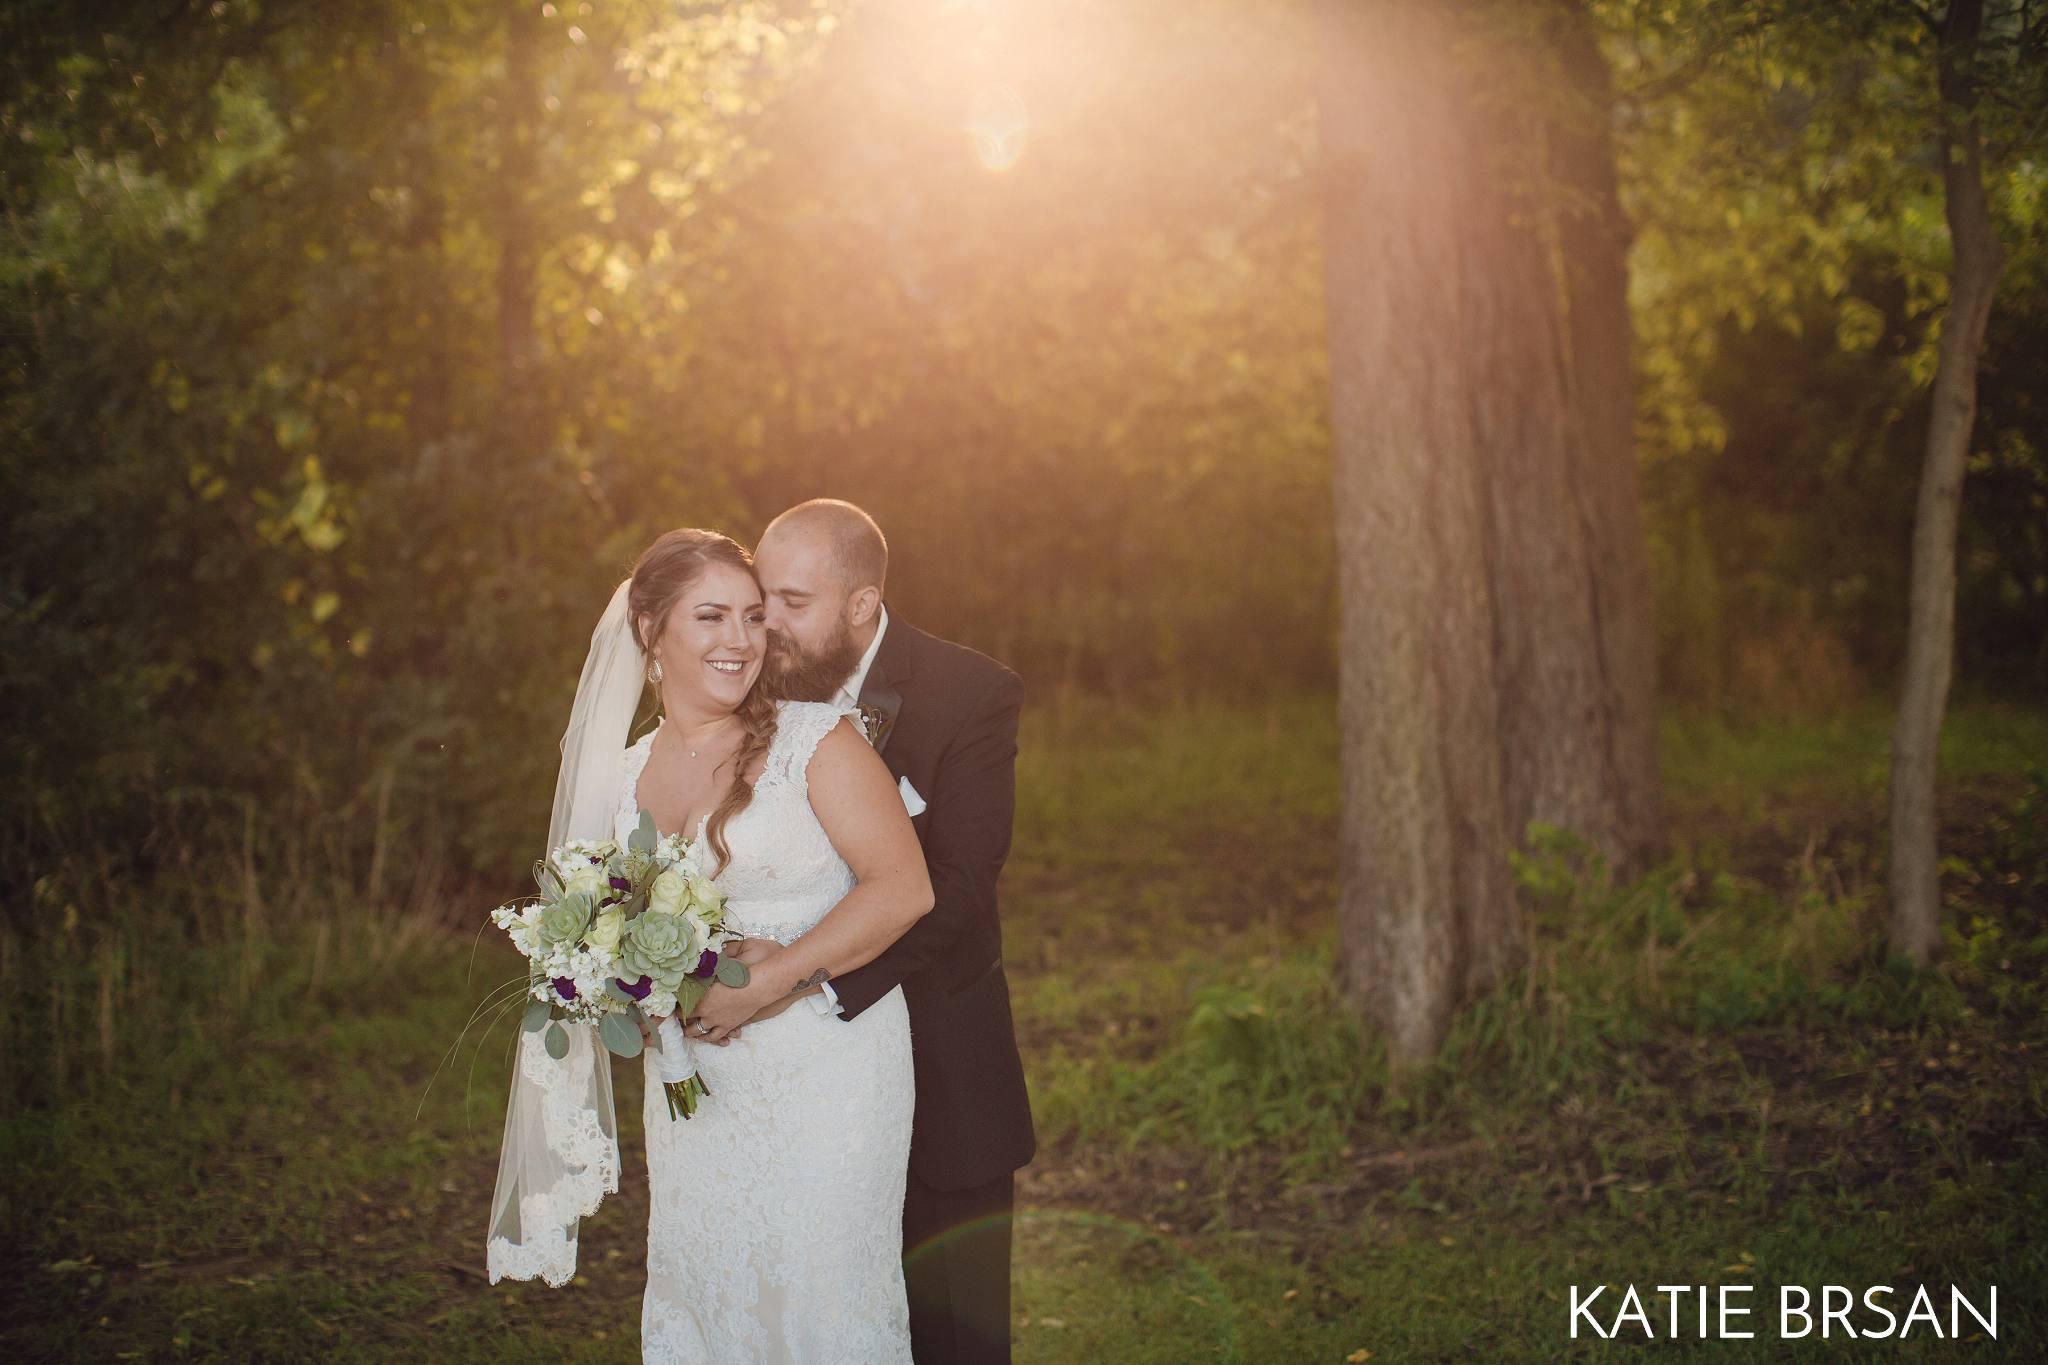 KatieBrsan-Bonfield-Backyard-Wedding_0418.jpg